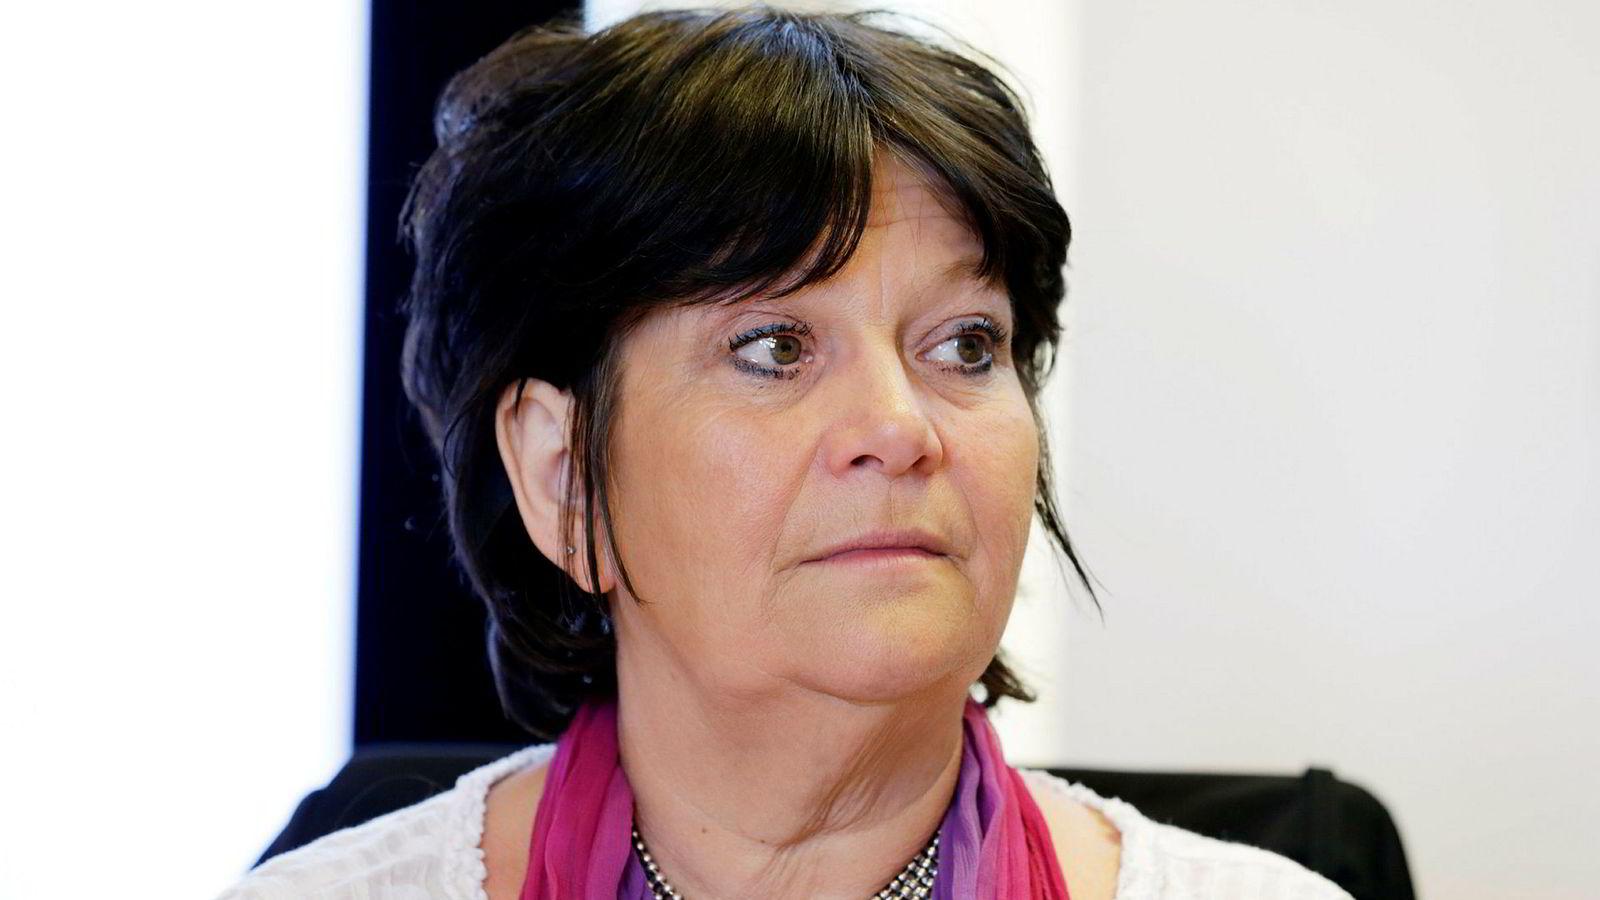 Fremskrittspartiets Ingebjørg Amanda Godskesen.